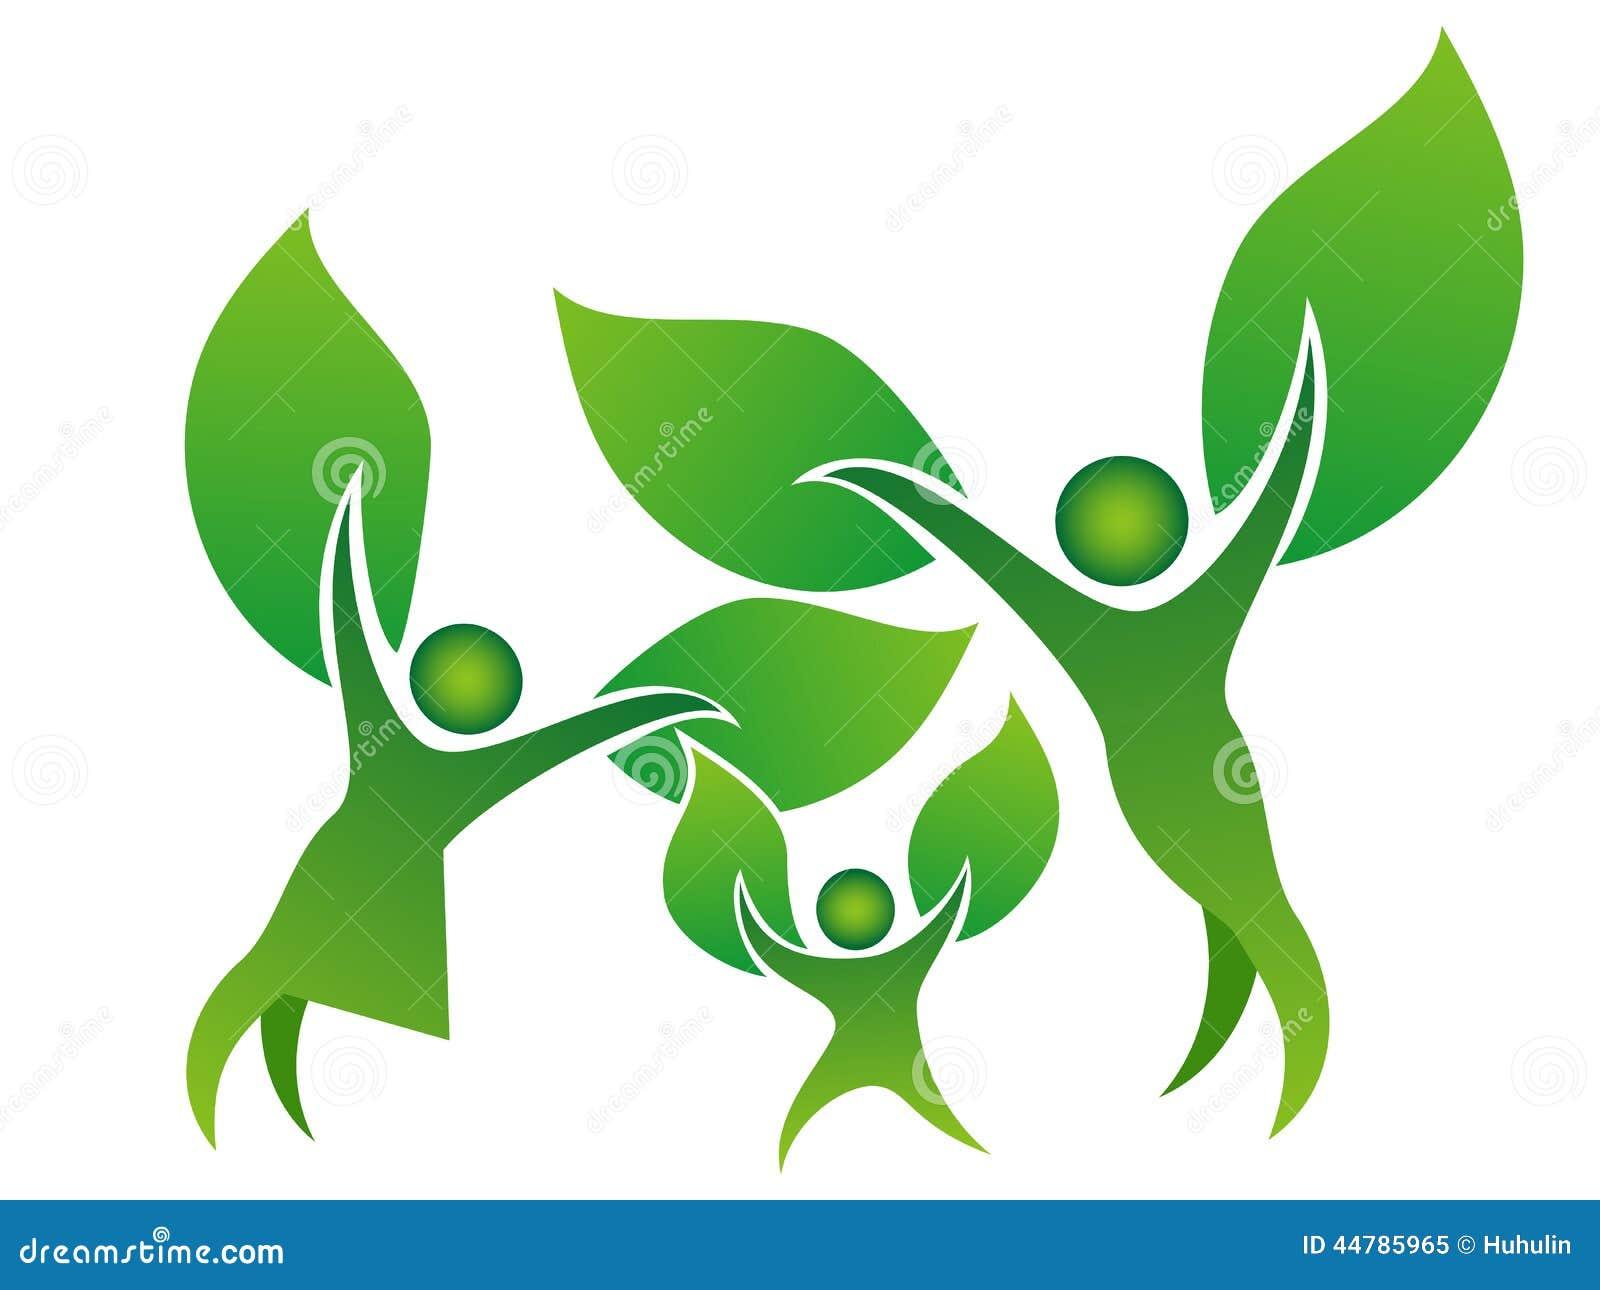 Family Tree Symbol Stock Vector Illustration Of Green 44785965